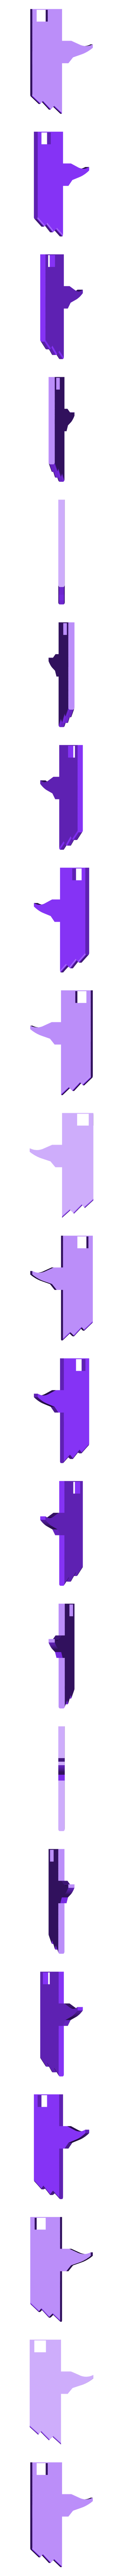 trigger riktig.stl Download STL file GUN SHOOTS RUBBERBAND  • 3D printing object, JonathanOlivarDizon